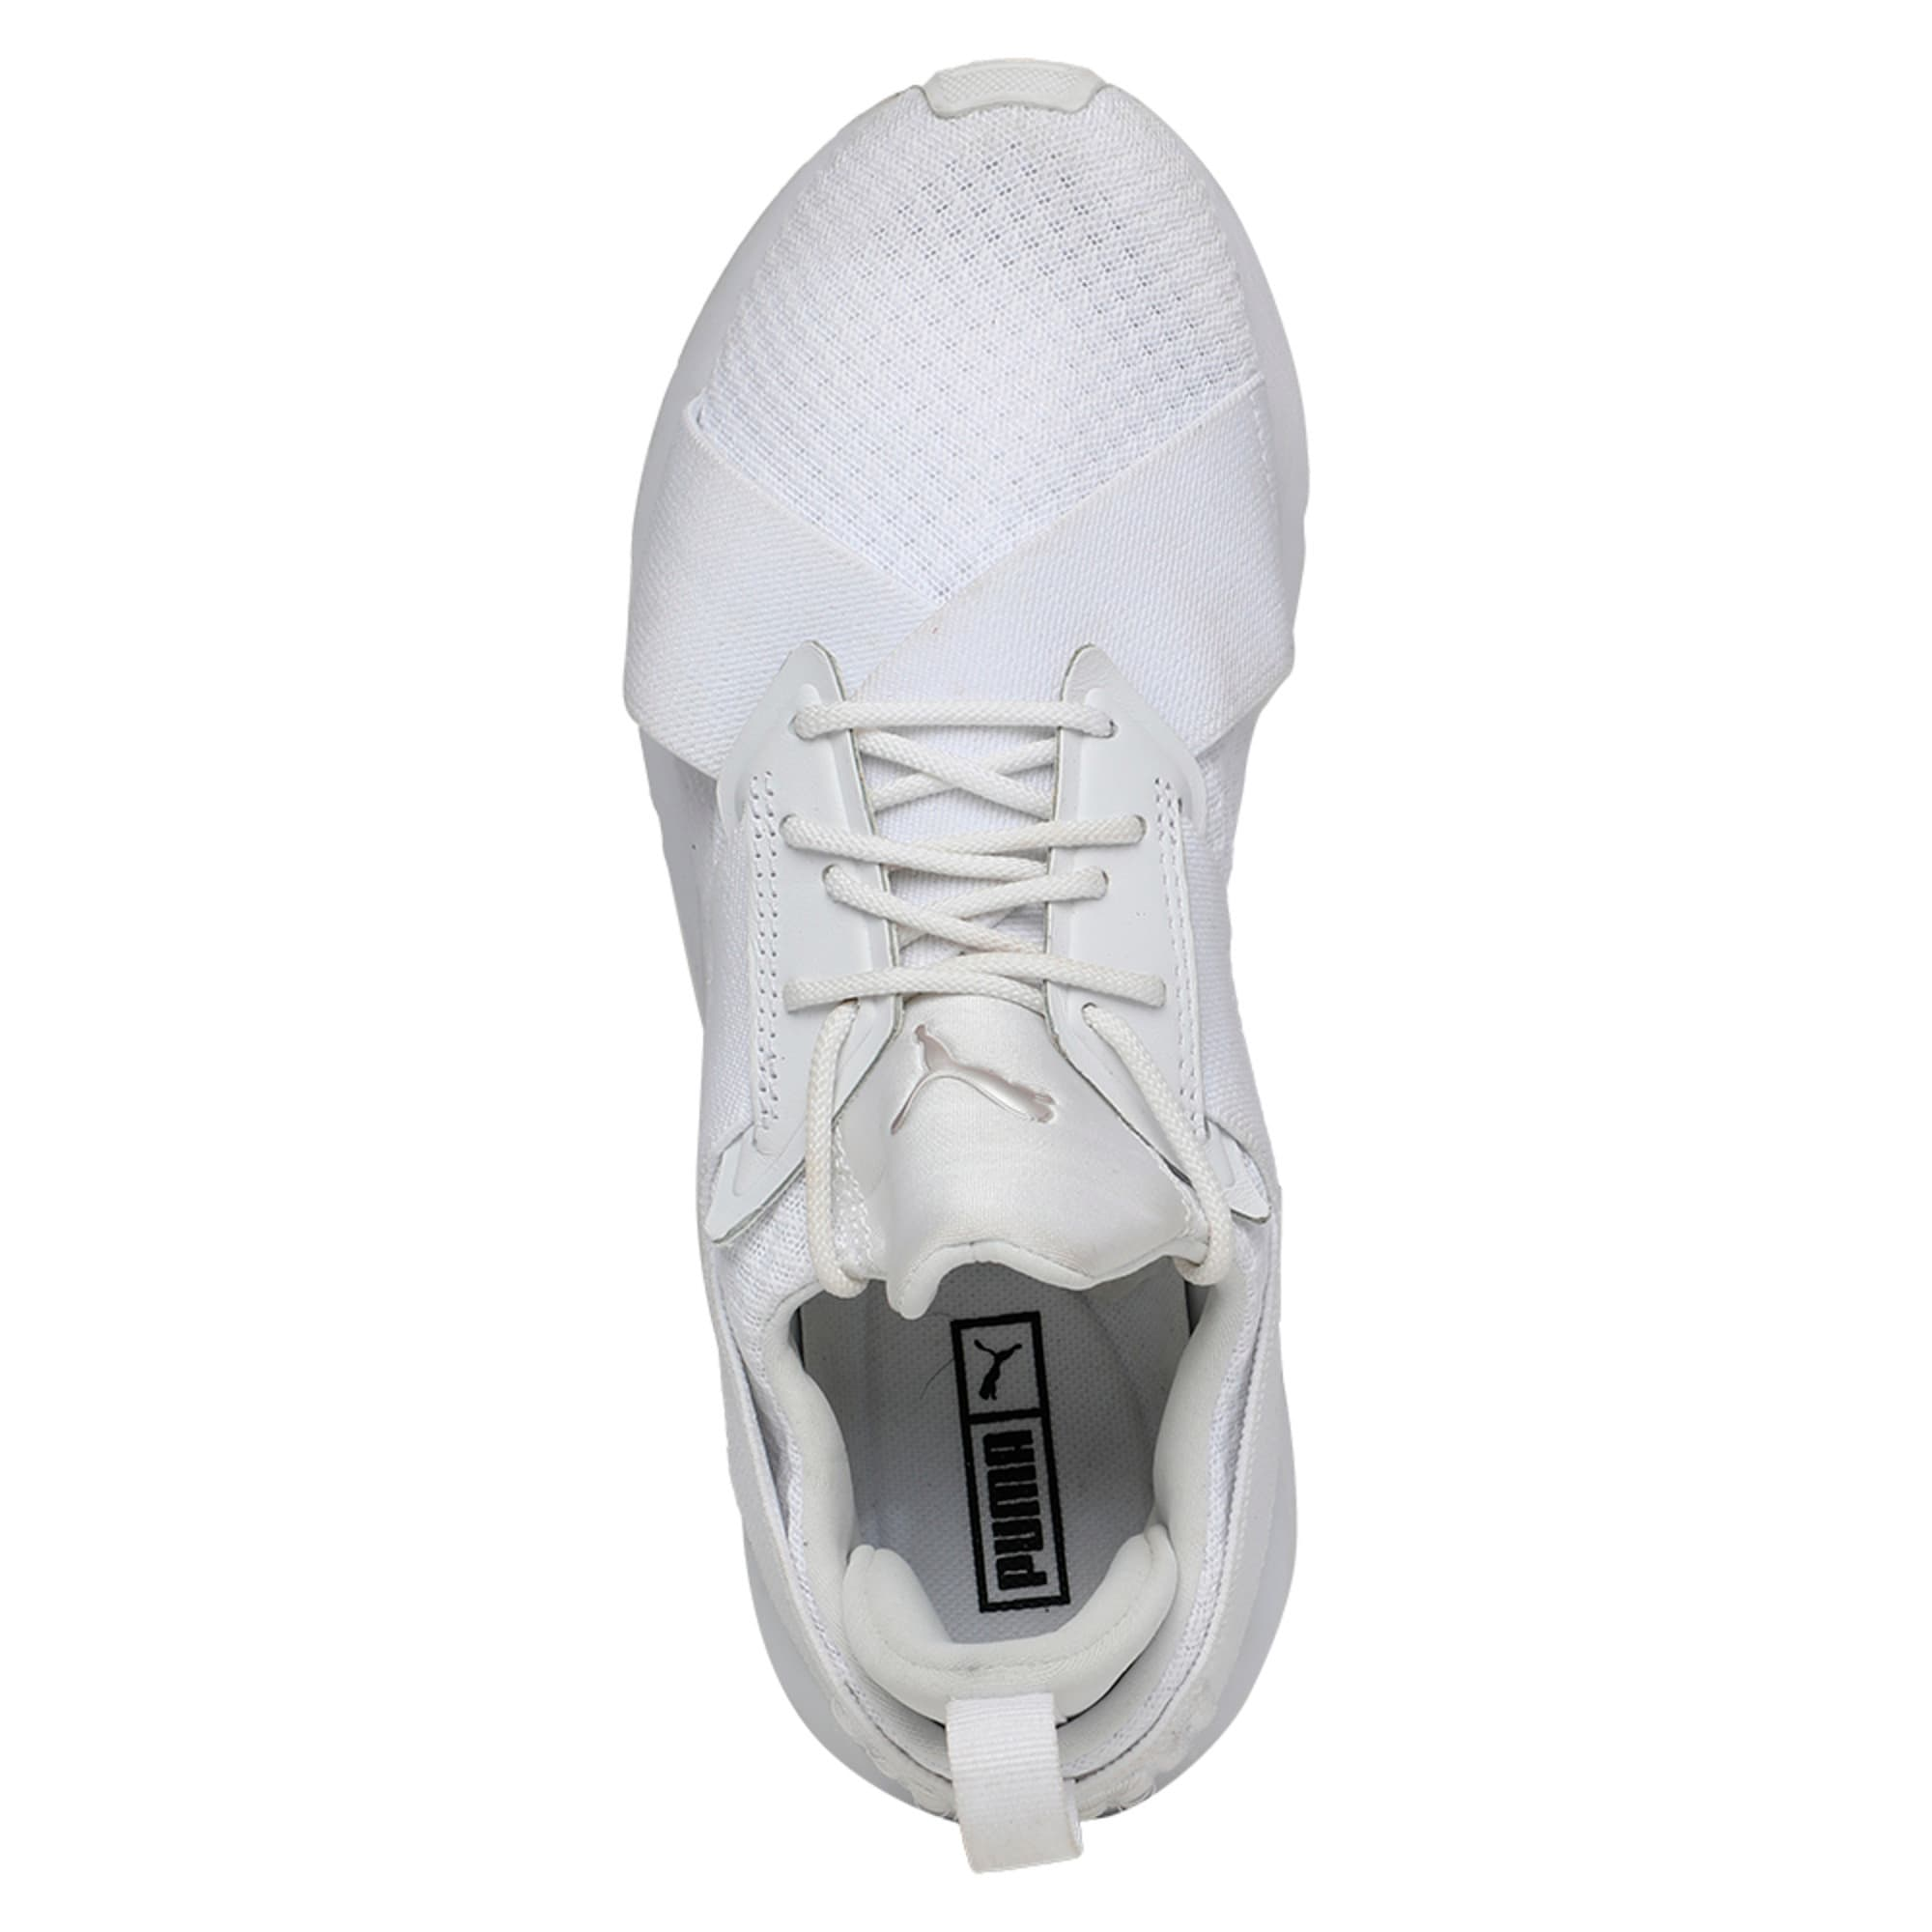 Thumbnail 4 of Muse En Pointe Women's Shoes, Puma White-Puma White, medium-IND